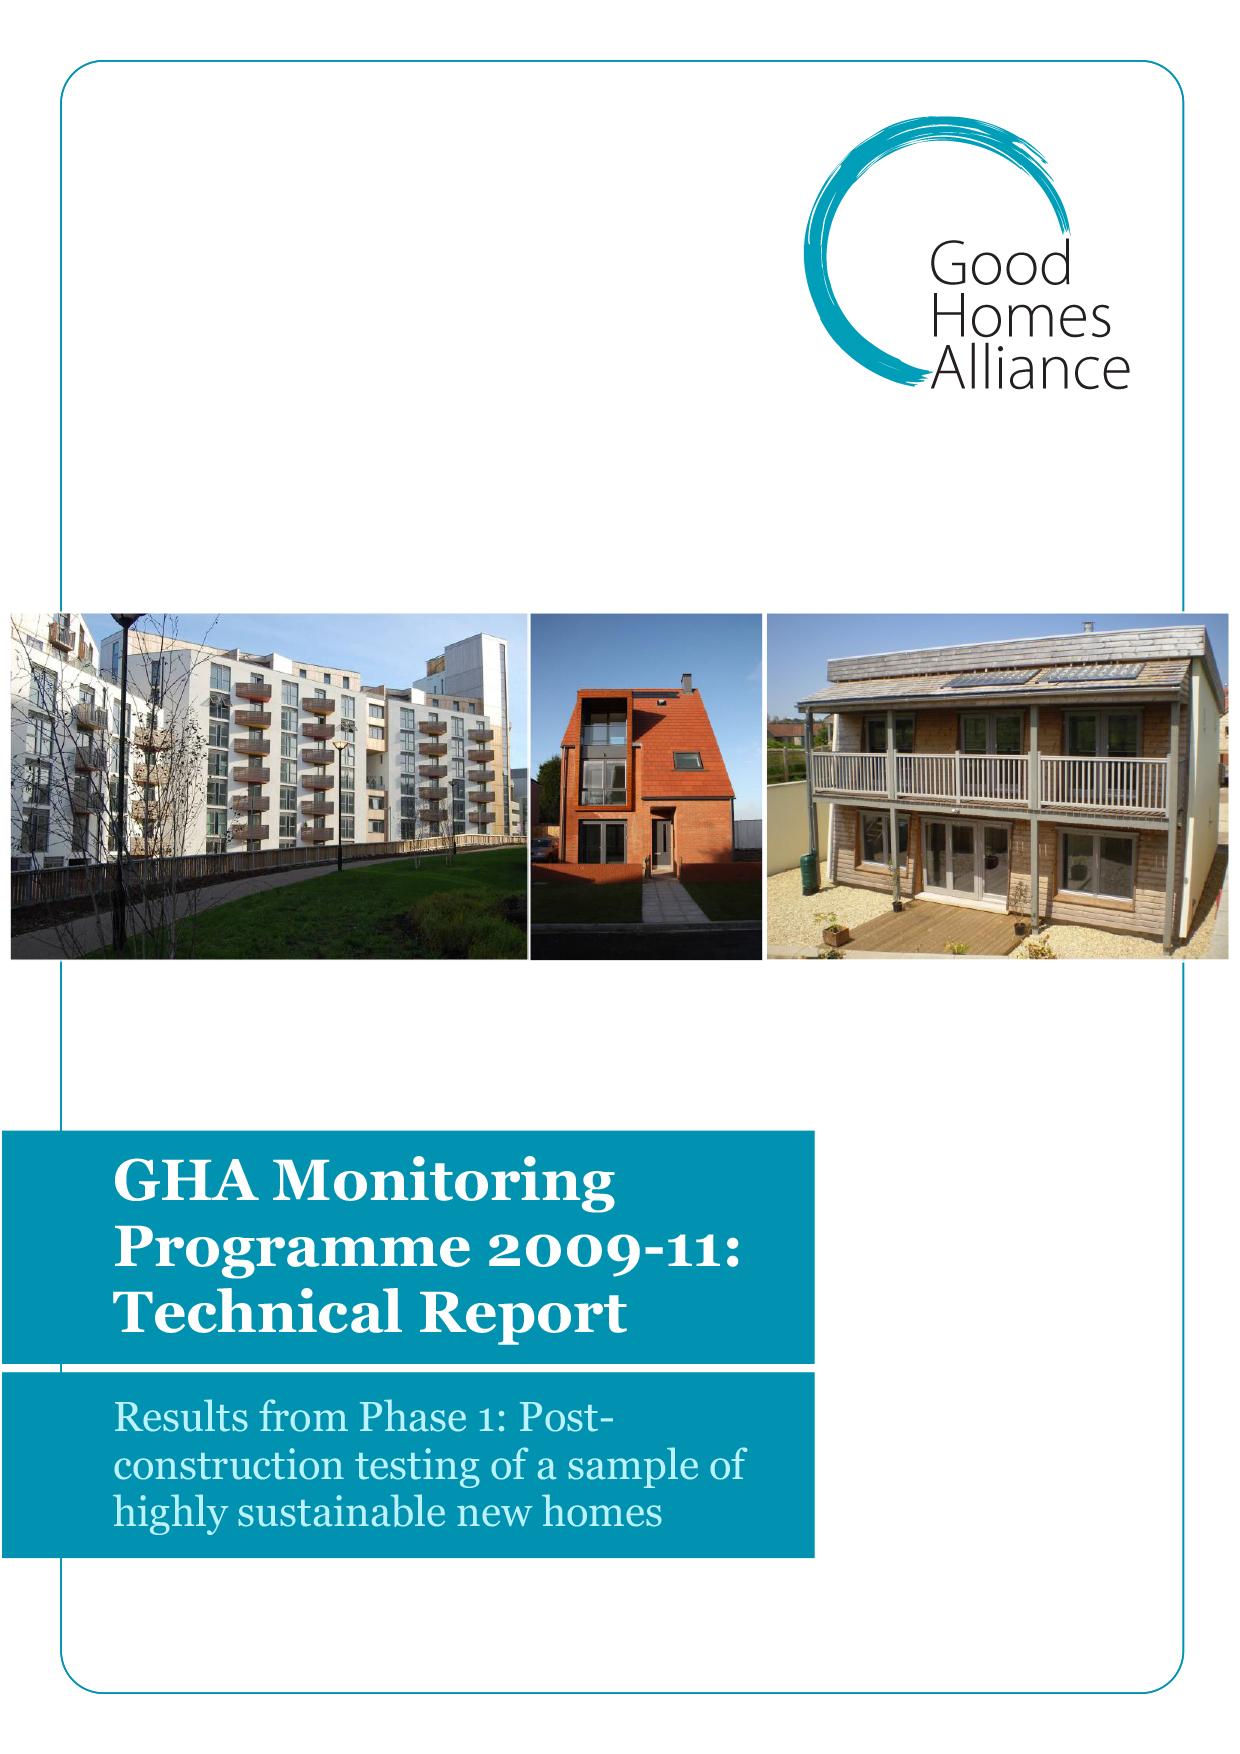 GHA Monitoring Programme